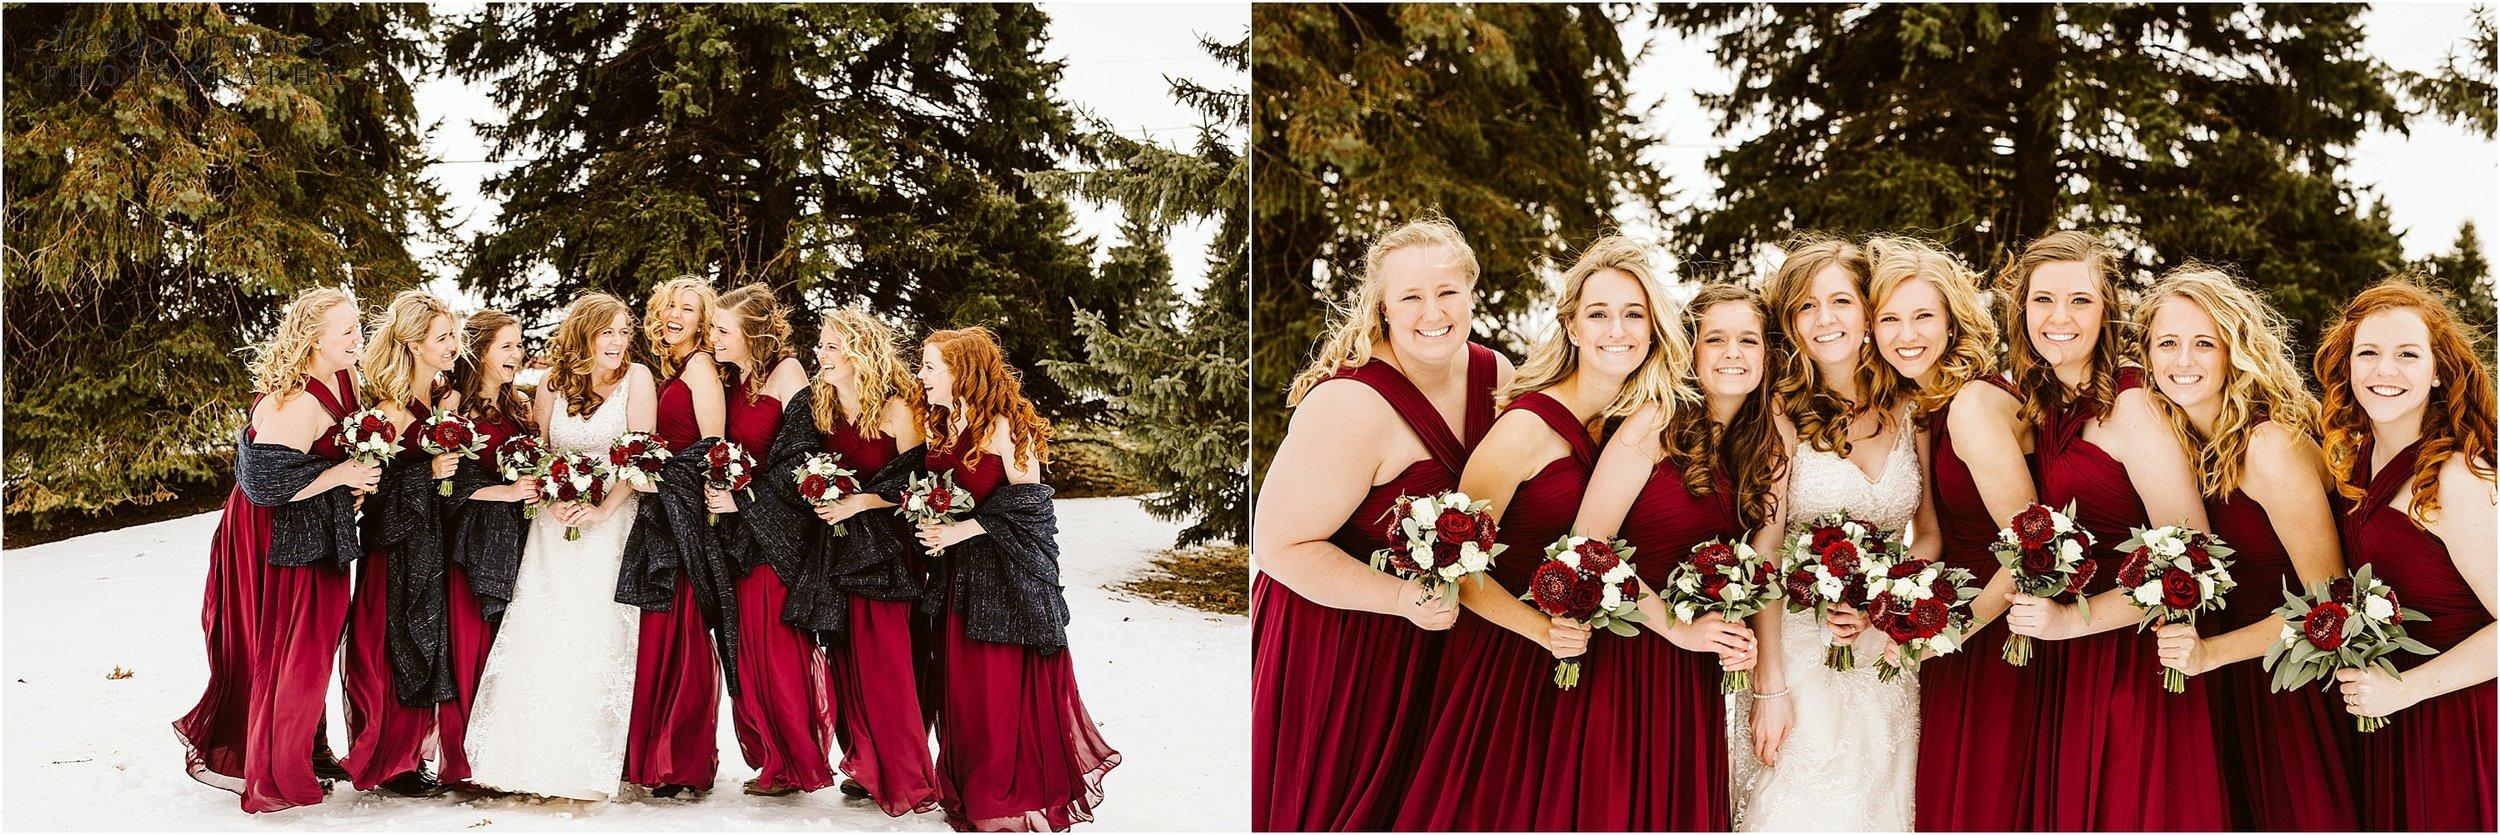 winter-wedding-in-eden-prairie-barn-minnesota-airplane-134.jpg